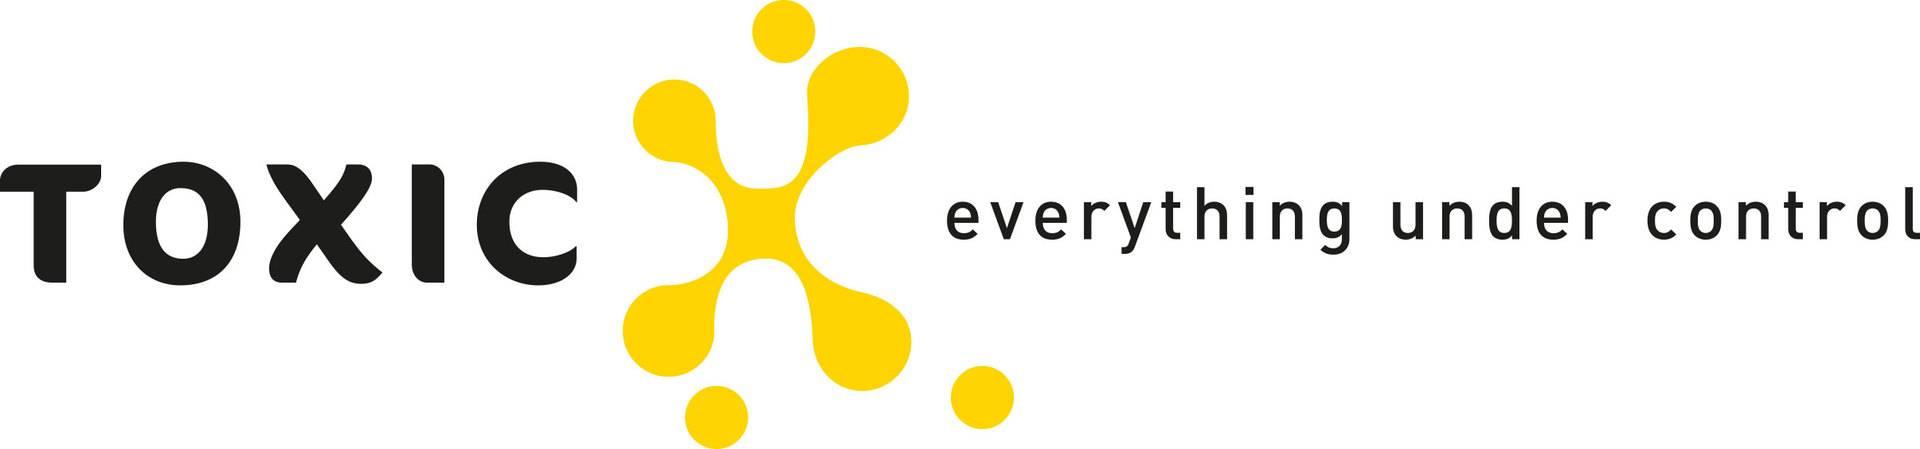 Toxic - logo